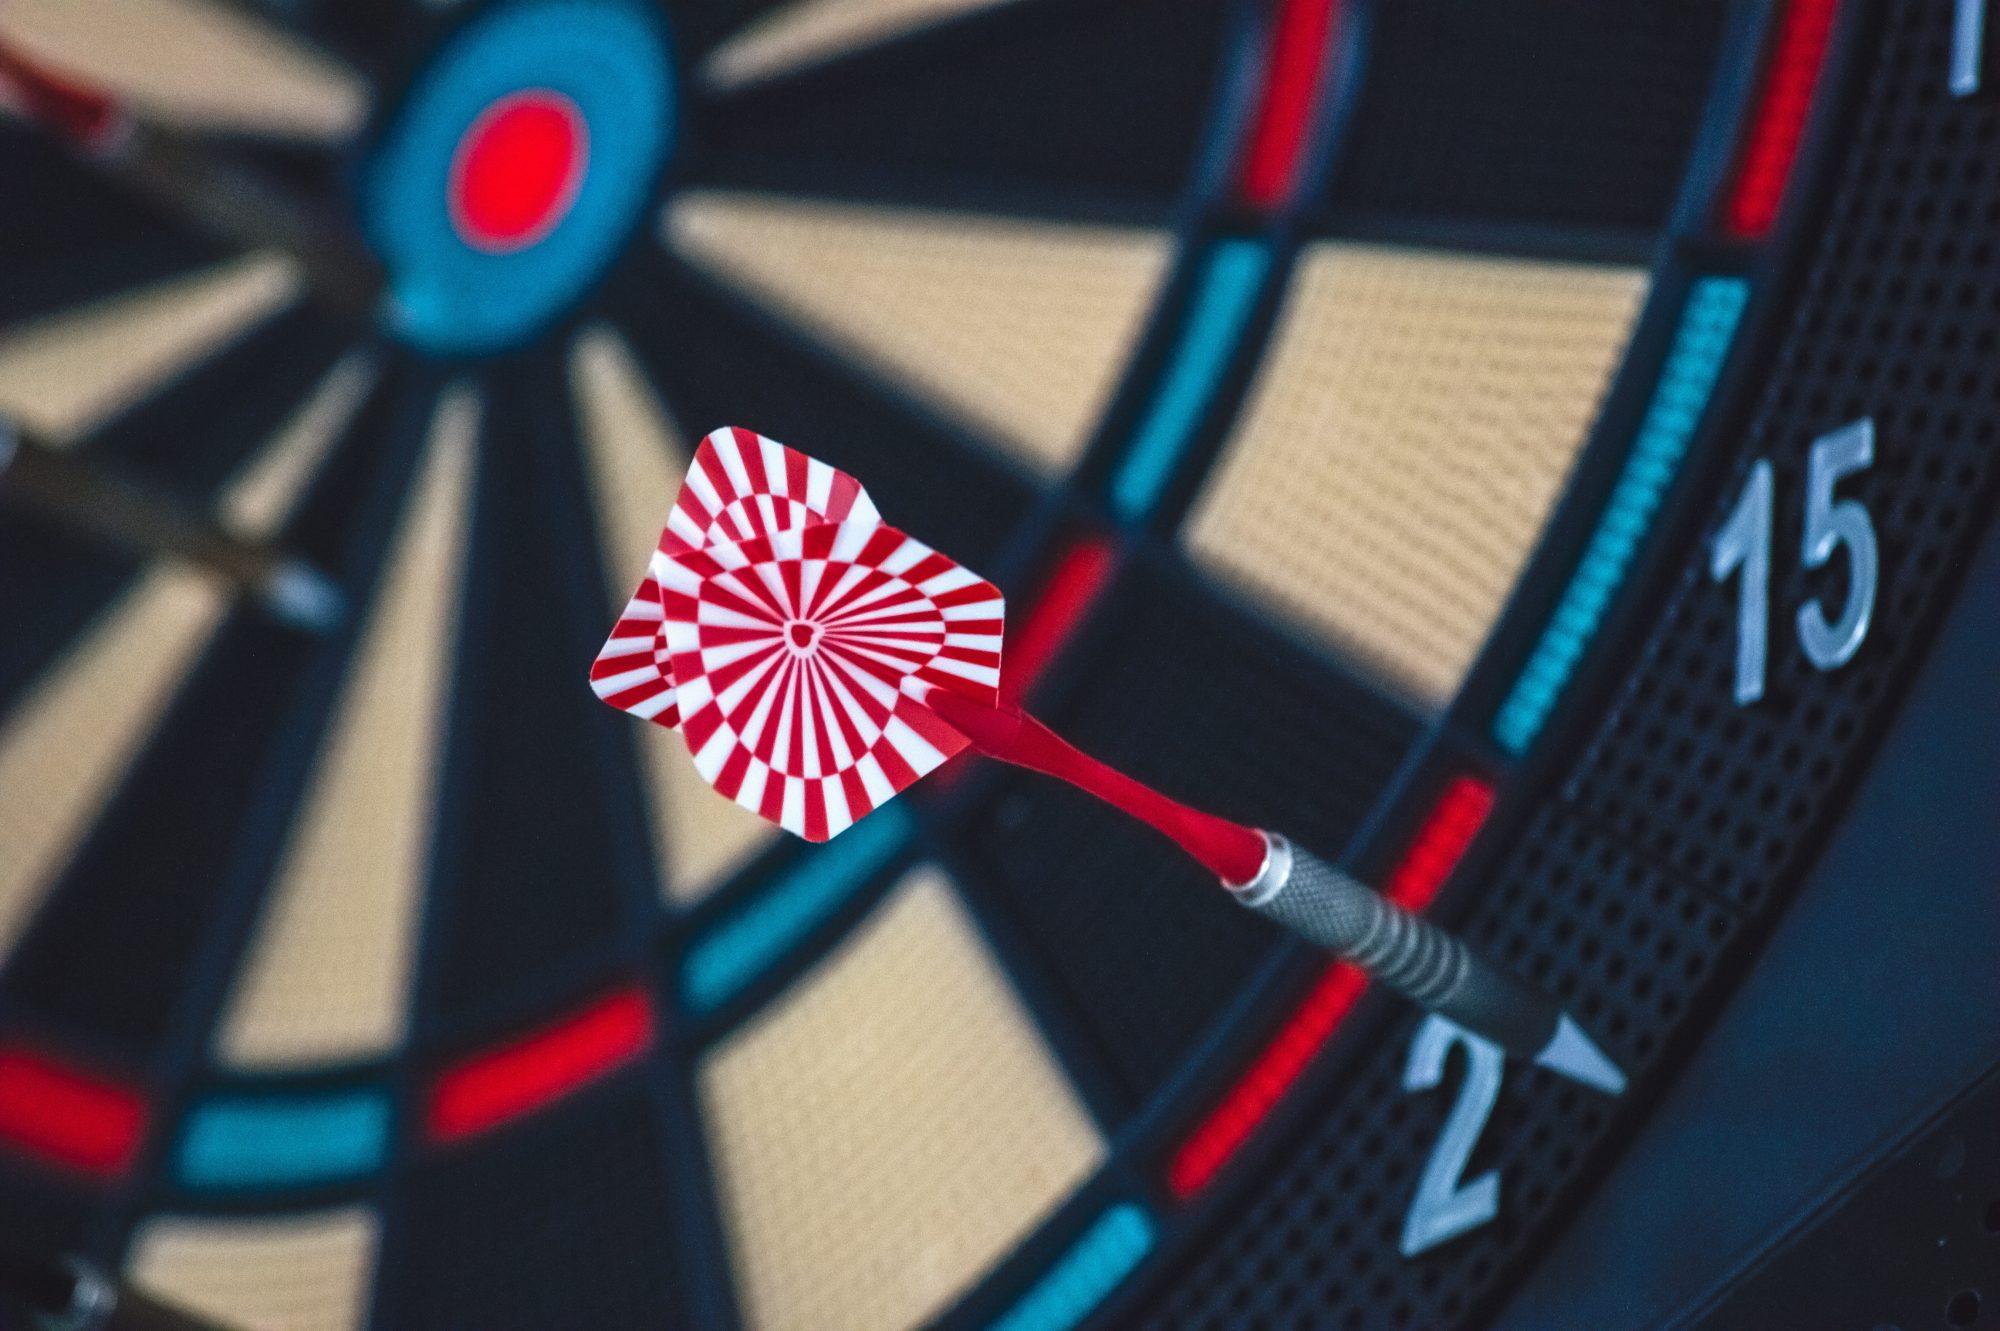 social media, digital marketing strategy, marketing strategy, brand